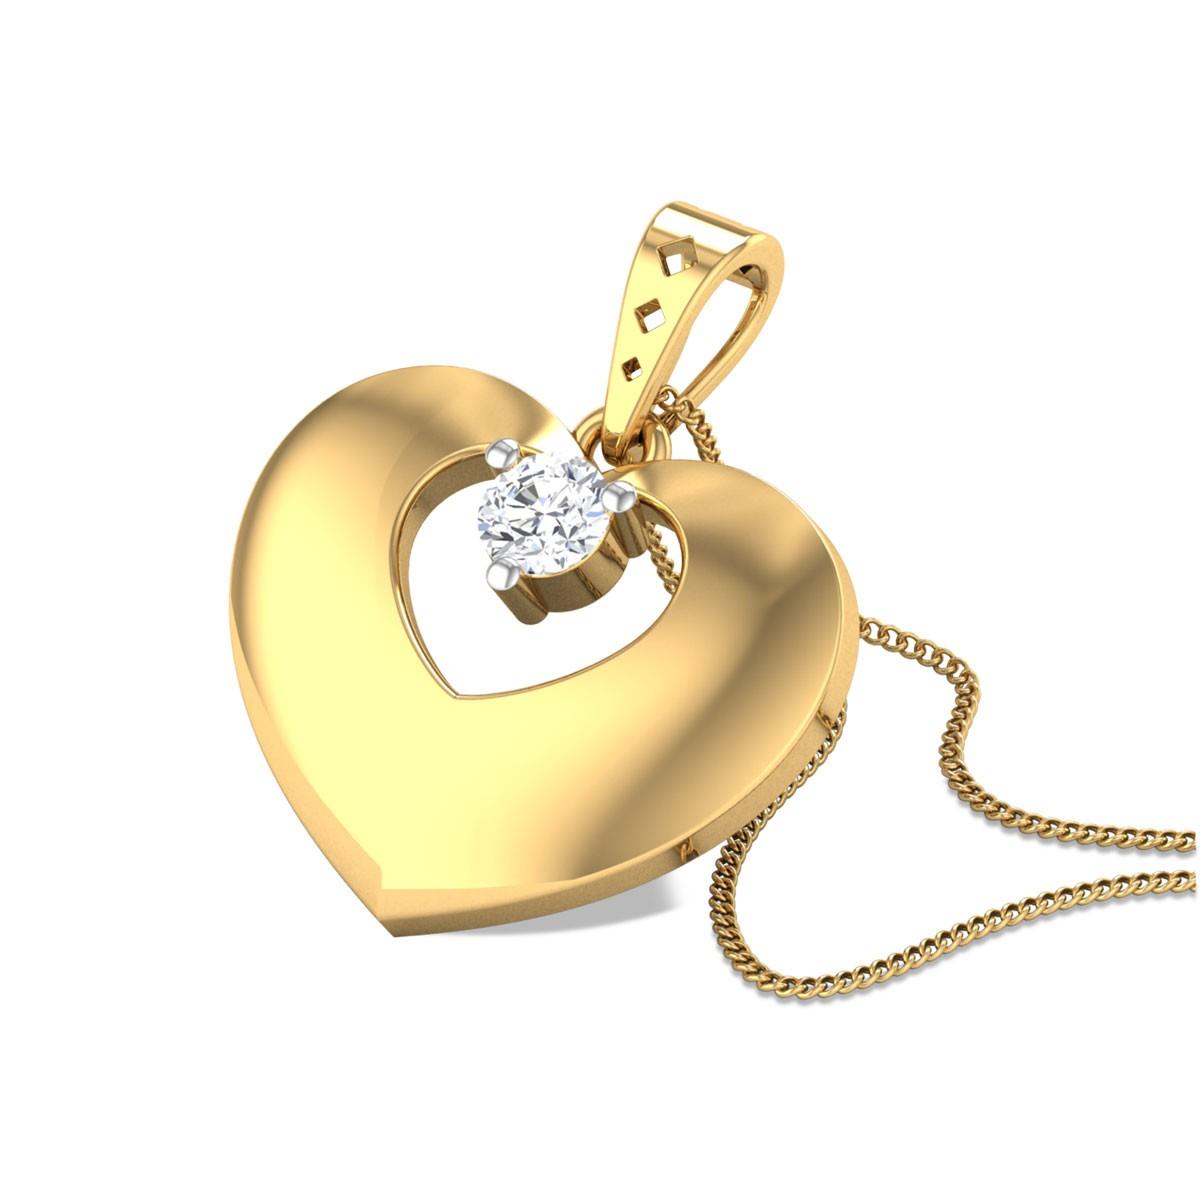 Ambrosine Heart Pendant